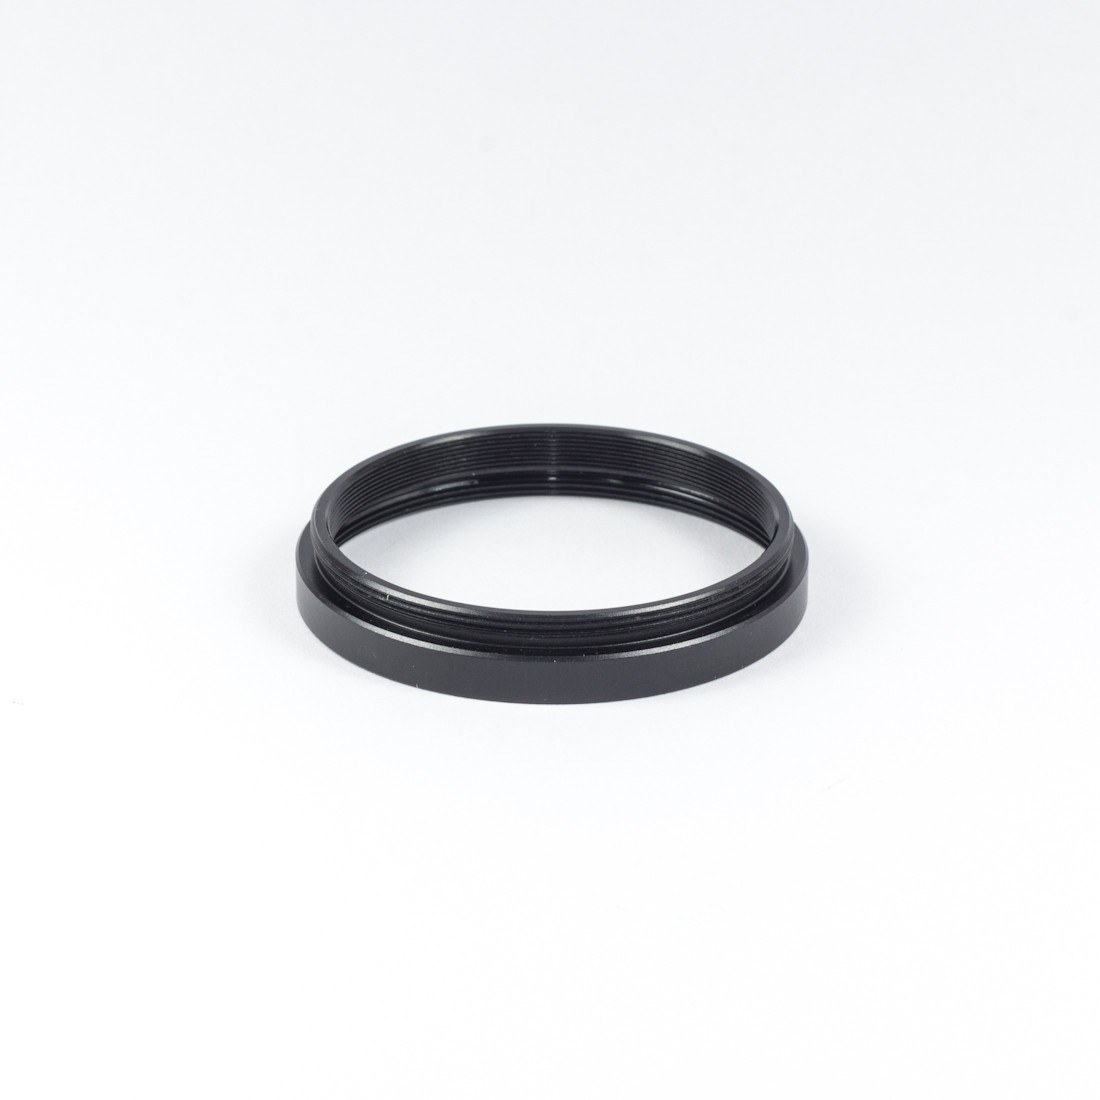 M48 Spacer Ring 5mm